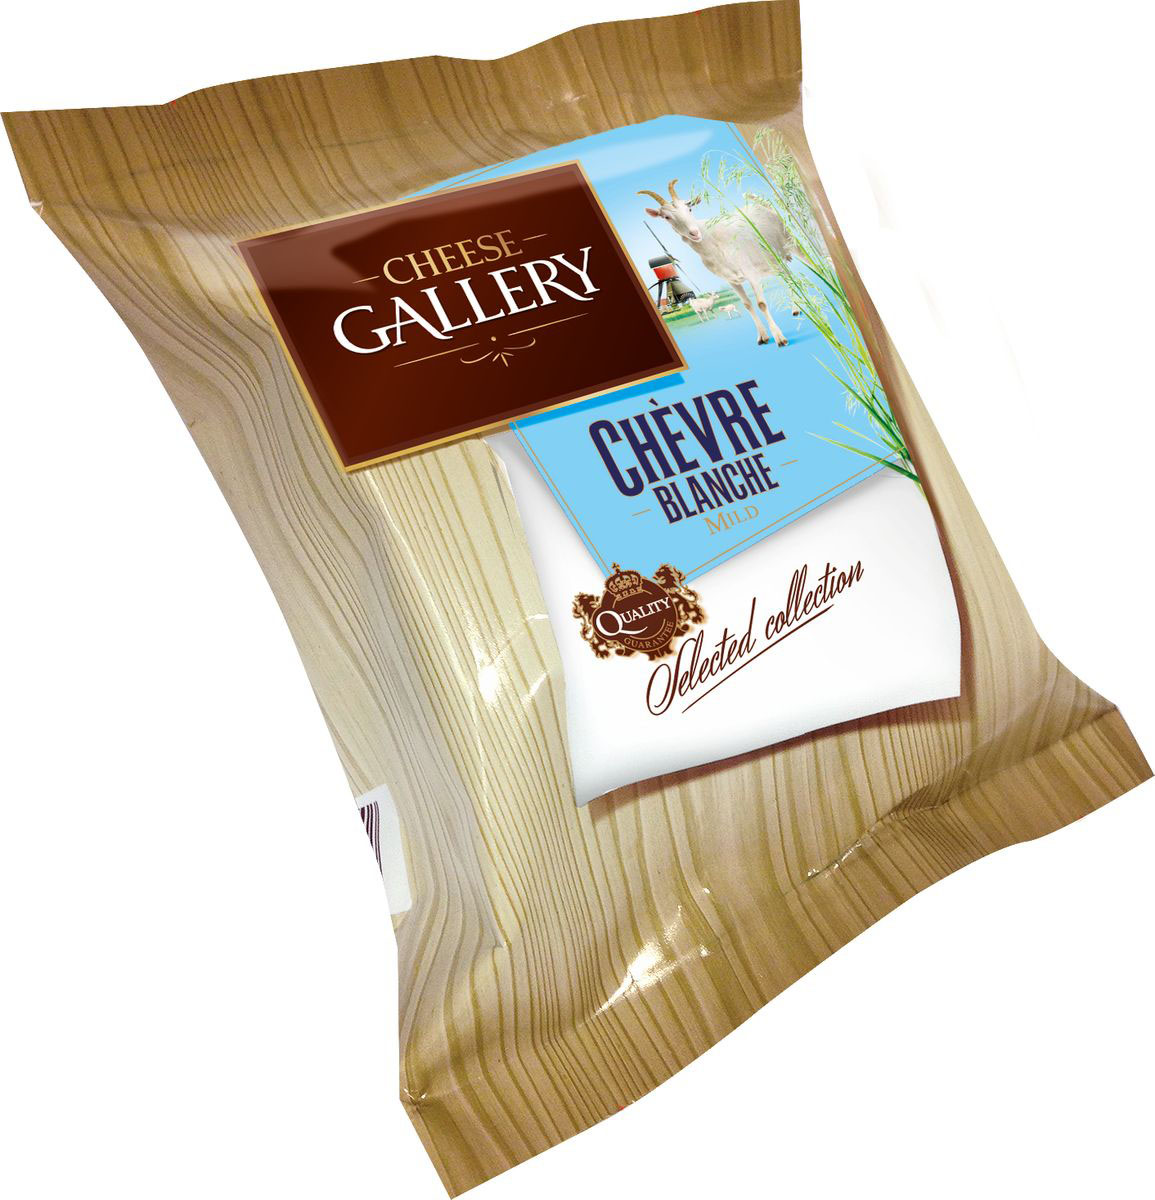 Cheese Gallery Сыр Козий, 50%, 175 г cheese gallery